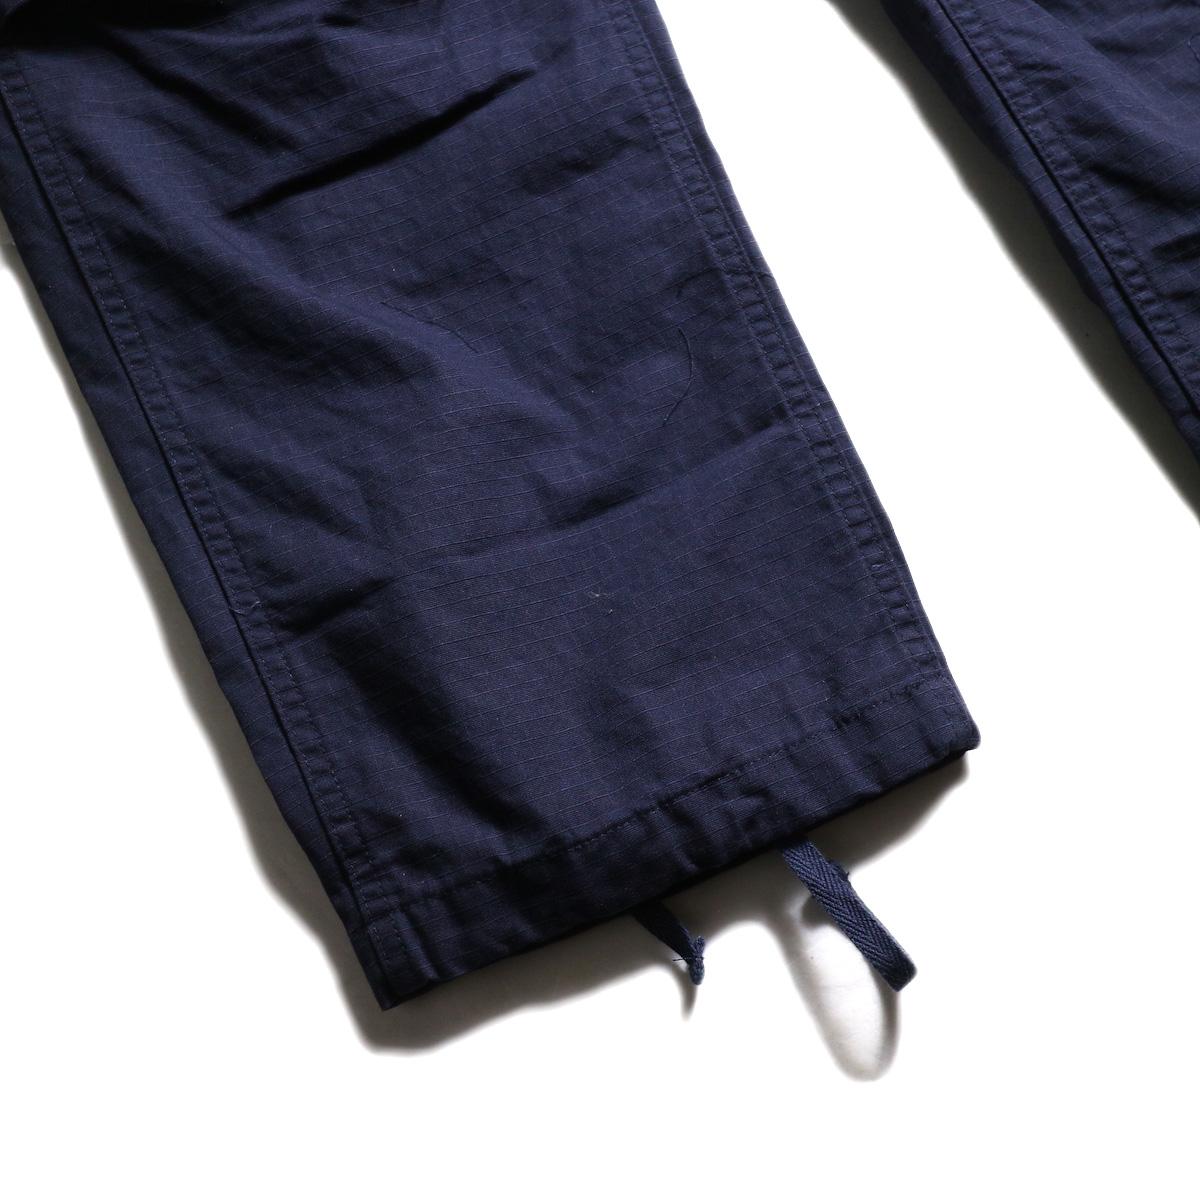 ENGINEERED GARMENTS /  FA Pant -Cotton Ripstop (Navy) ドローコード